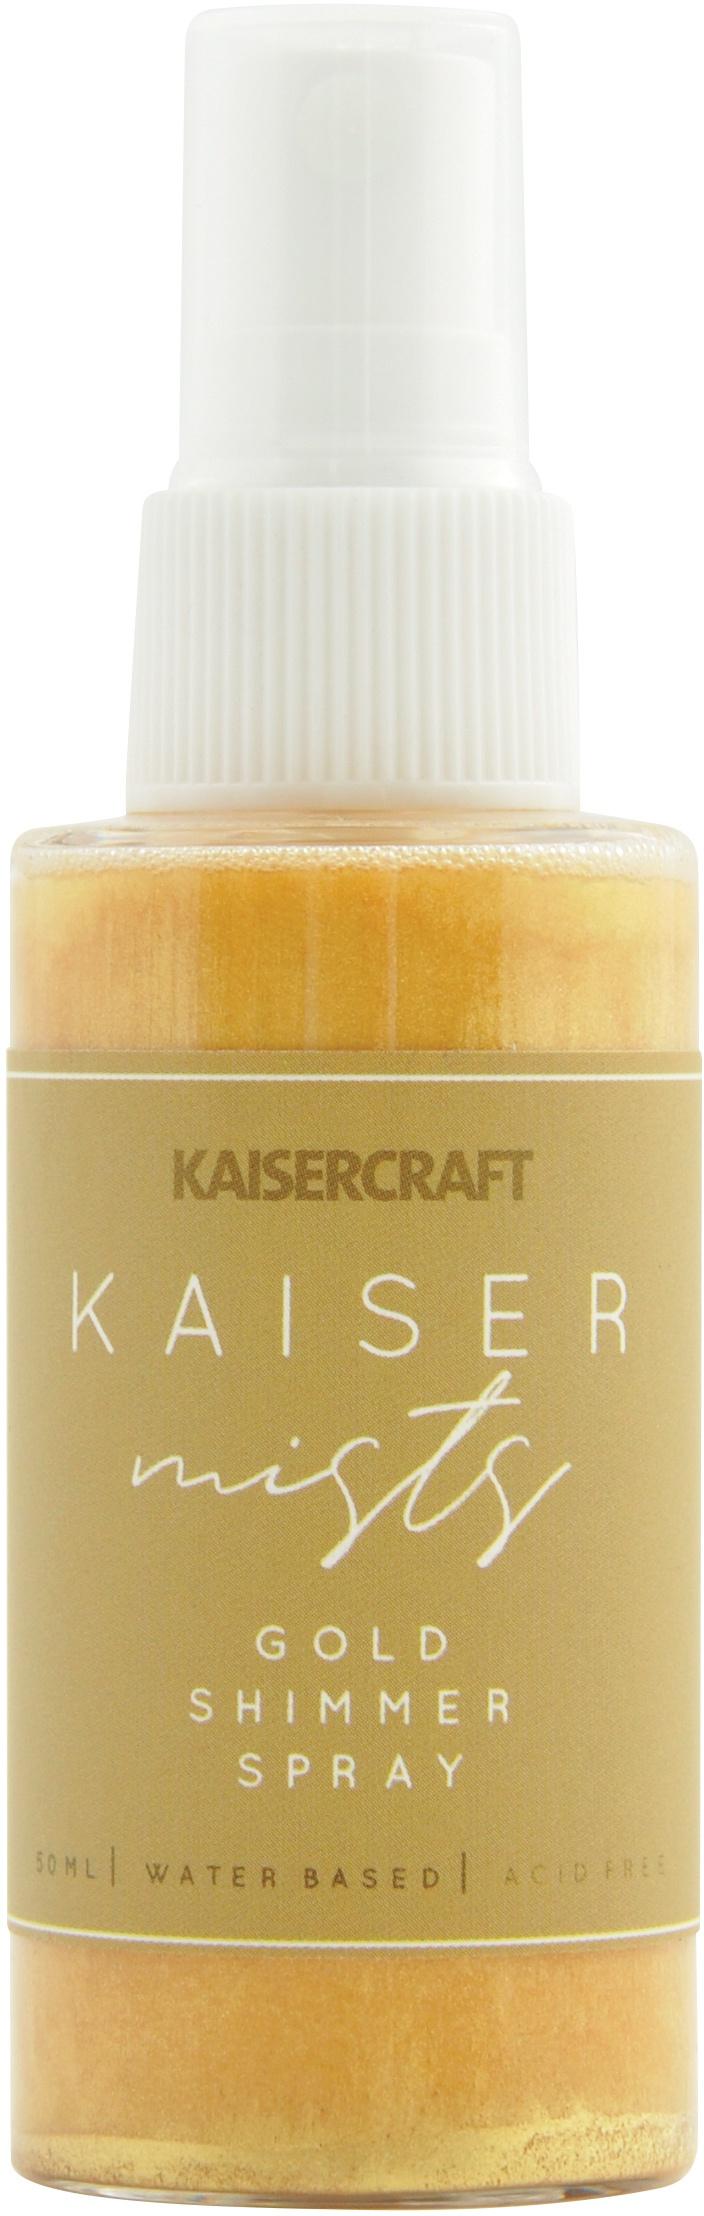 KaiserMists Iridescent Ink Spray 1.5oz-Gold Shimmer